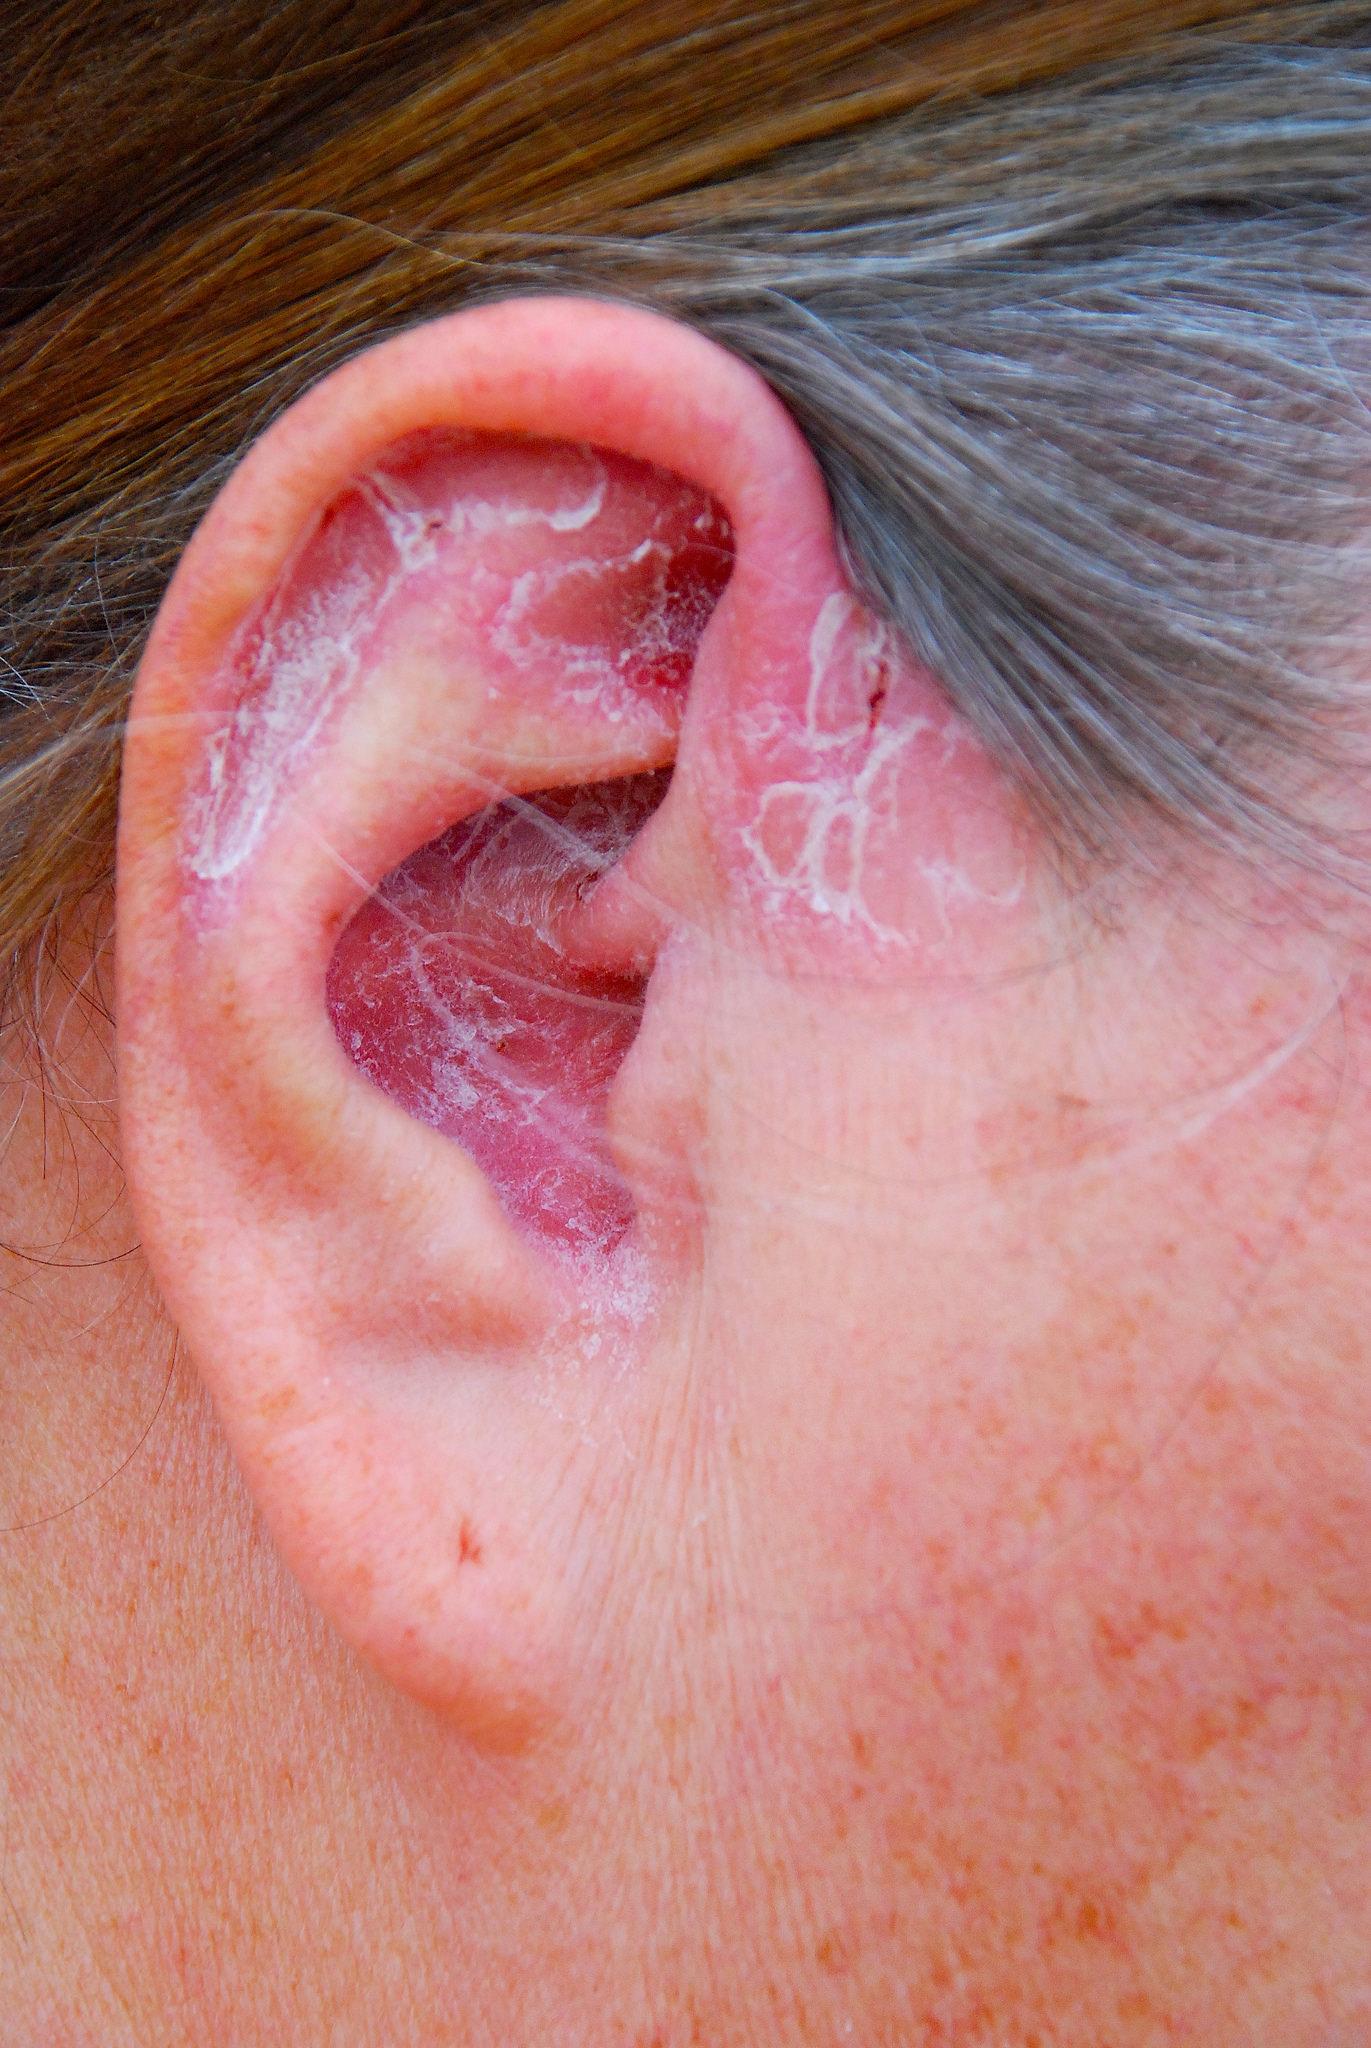 psoriasis on ear, skin problem